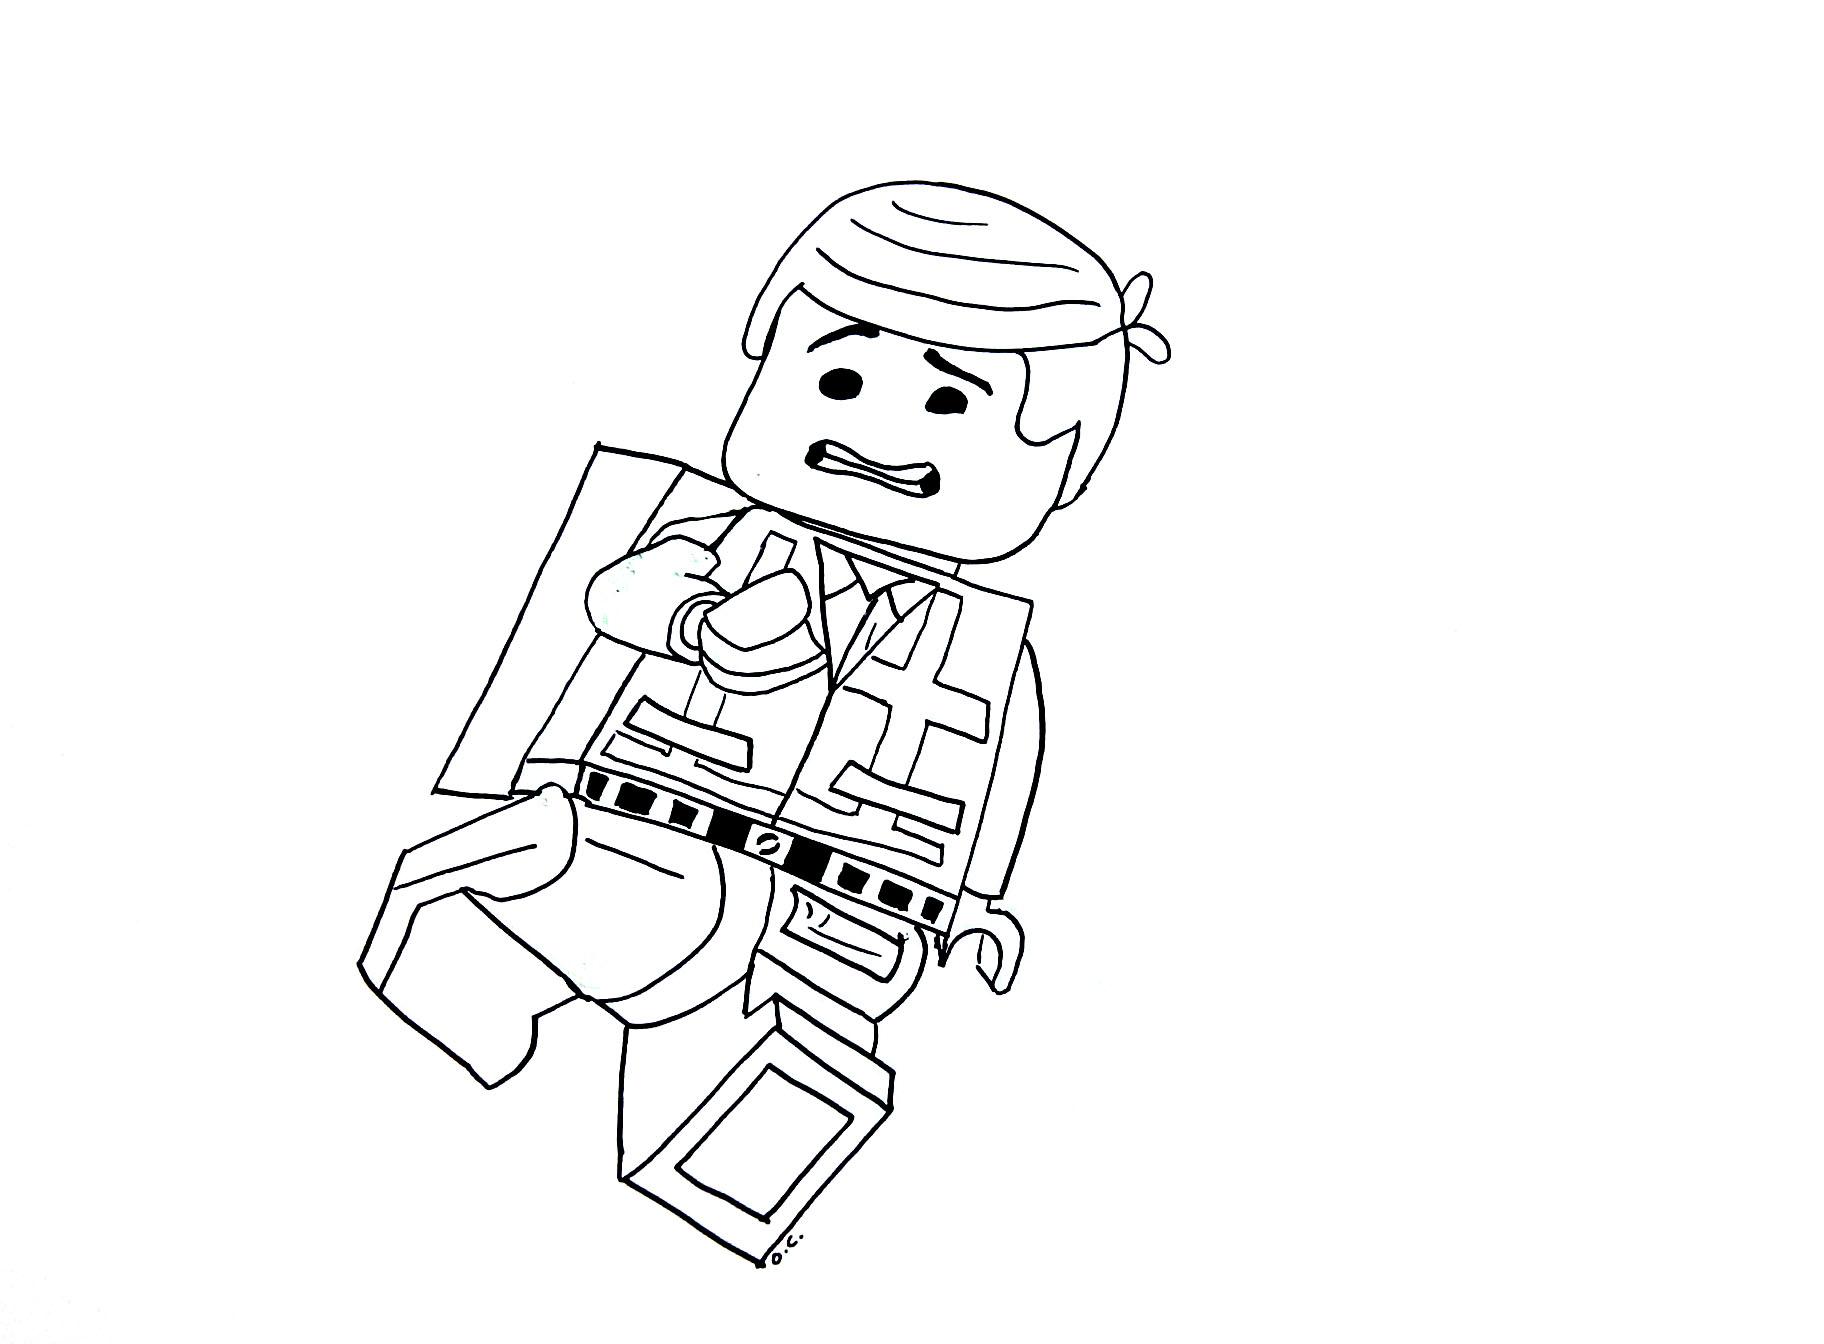 Lego la grande aventure coloriage legos coloriages - Jeux de ninjago gratuit lego ...